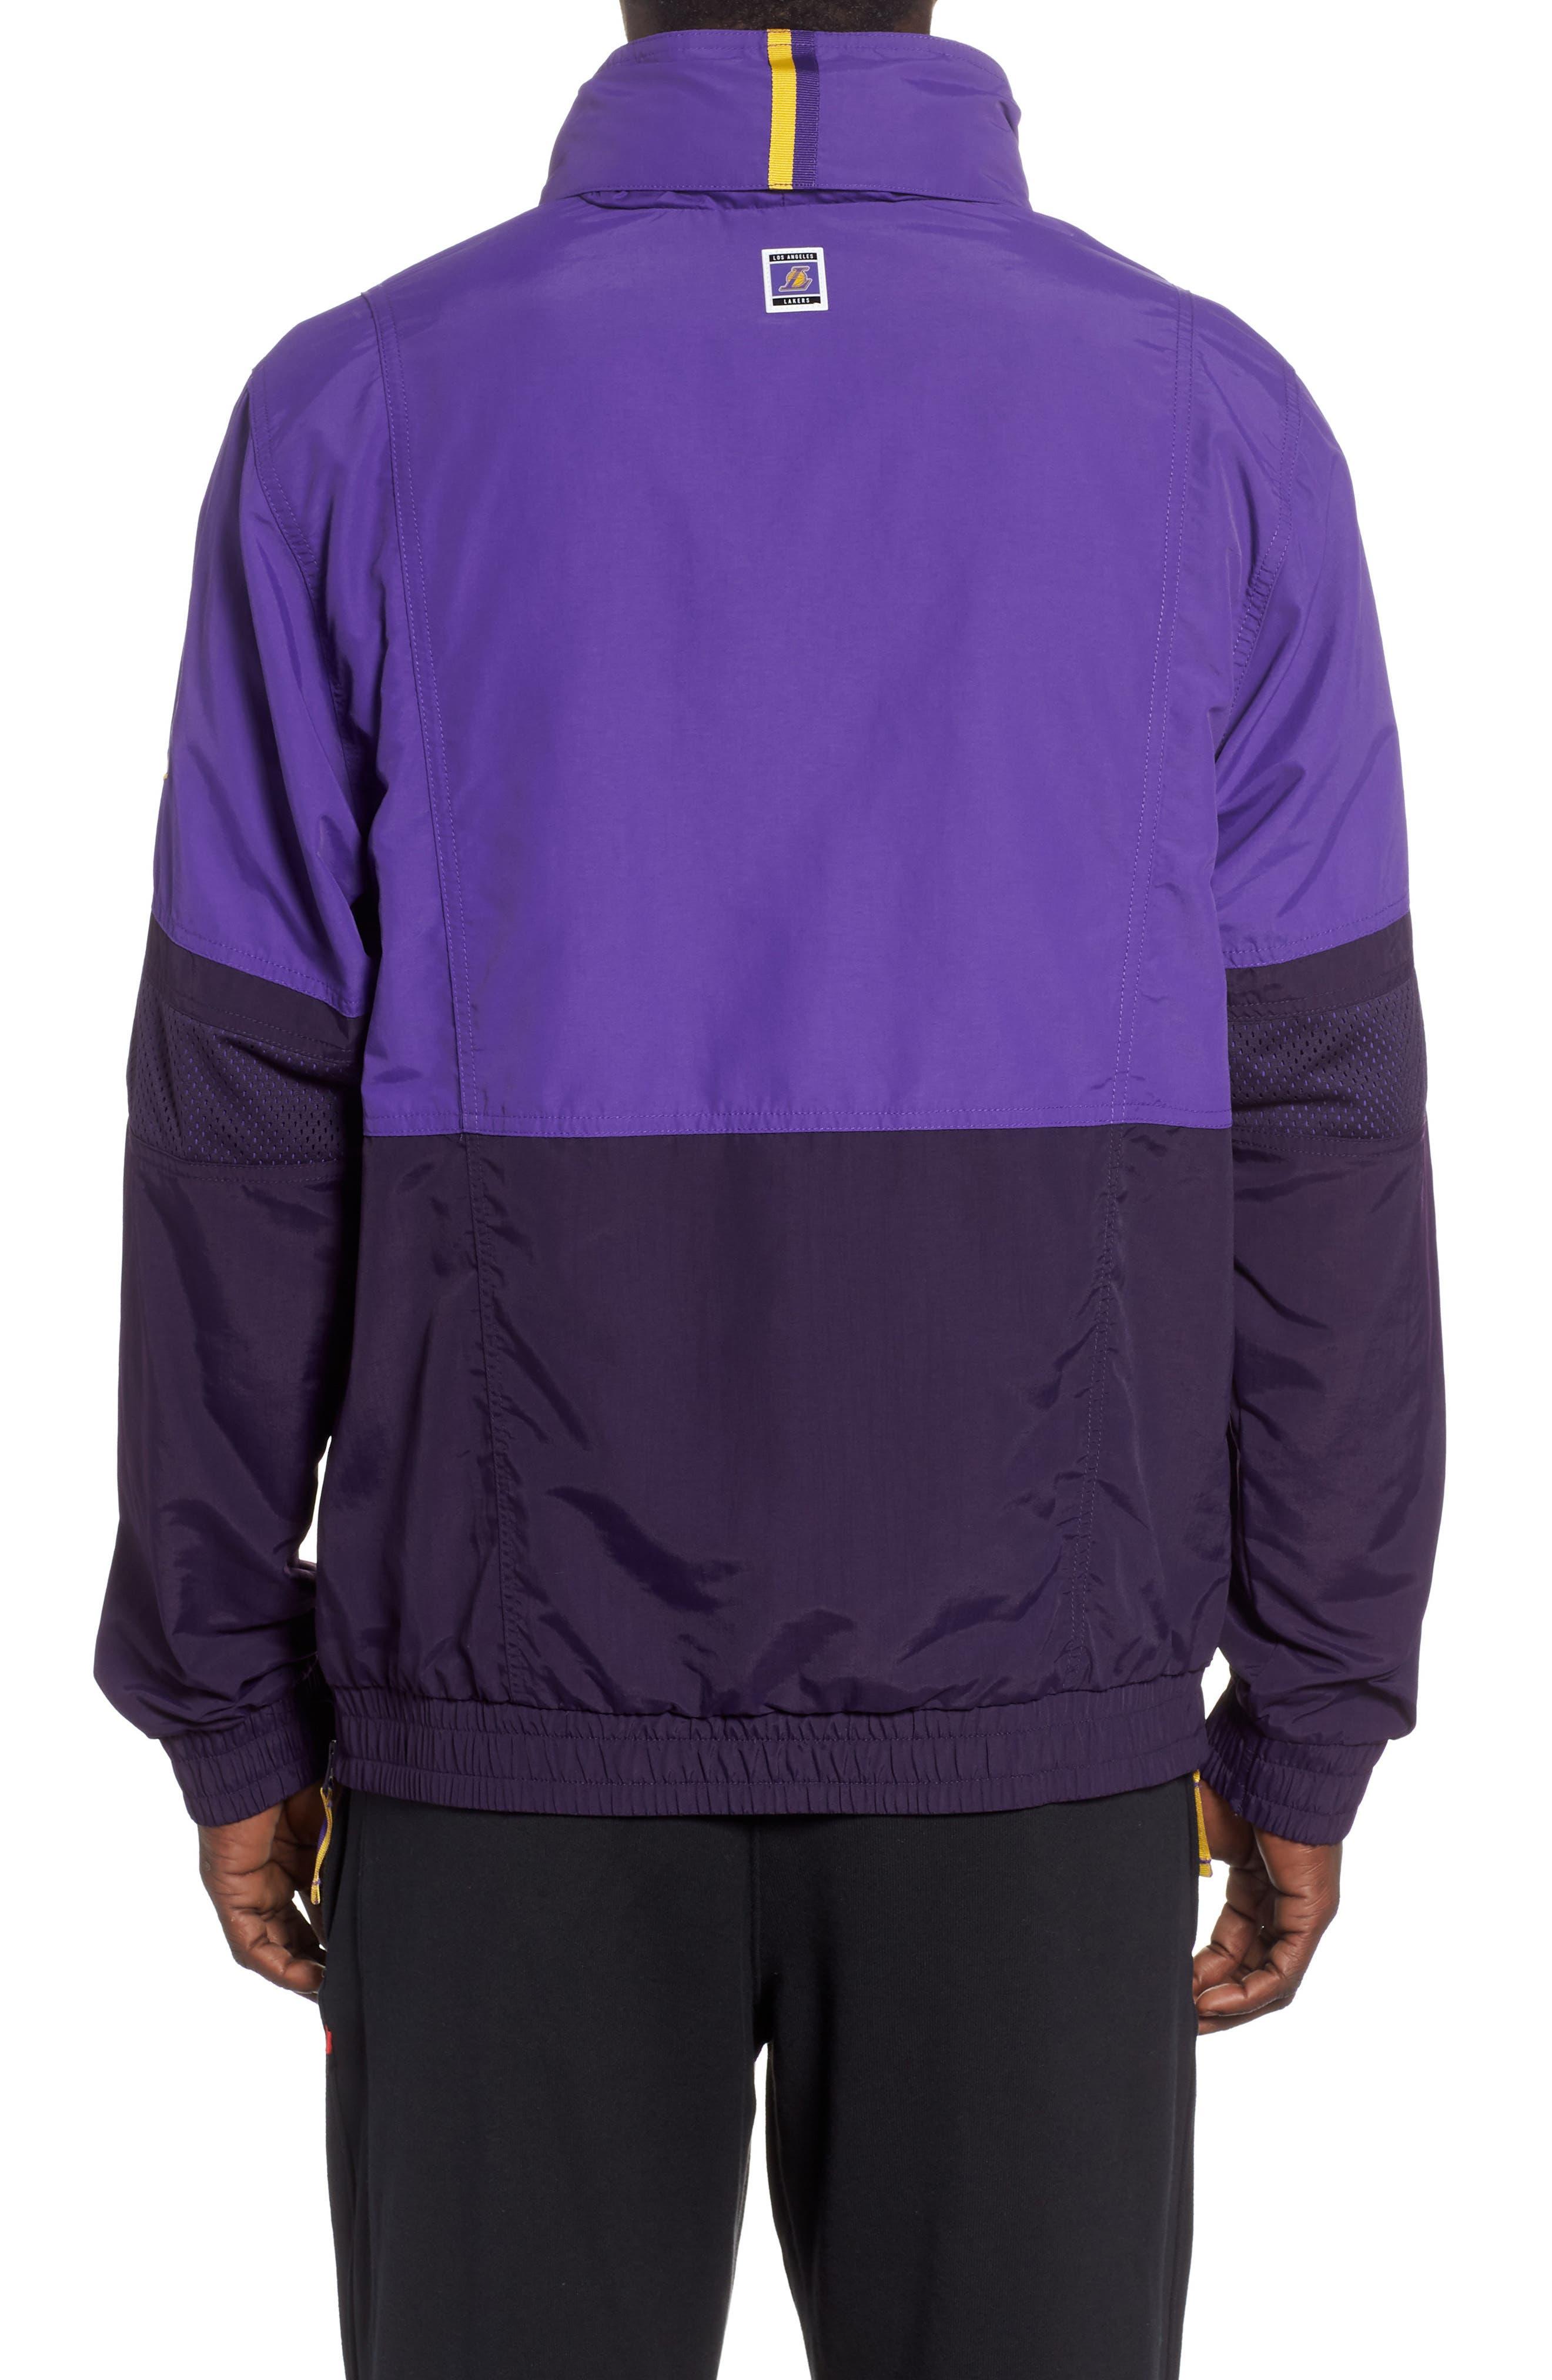 Los Angeles Lakers Courtside Warm-Up Jacket,                             Alternate thumbnail 2, color,                             FIELD PURPLE/PURPLE/ AMARILLO